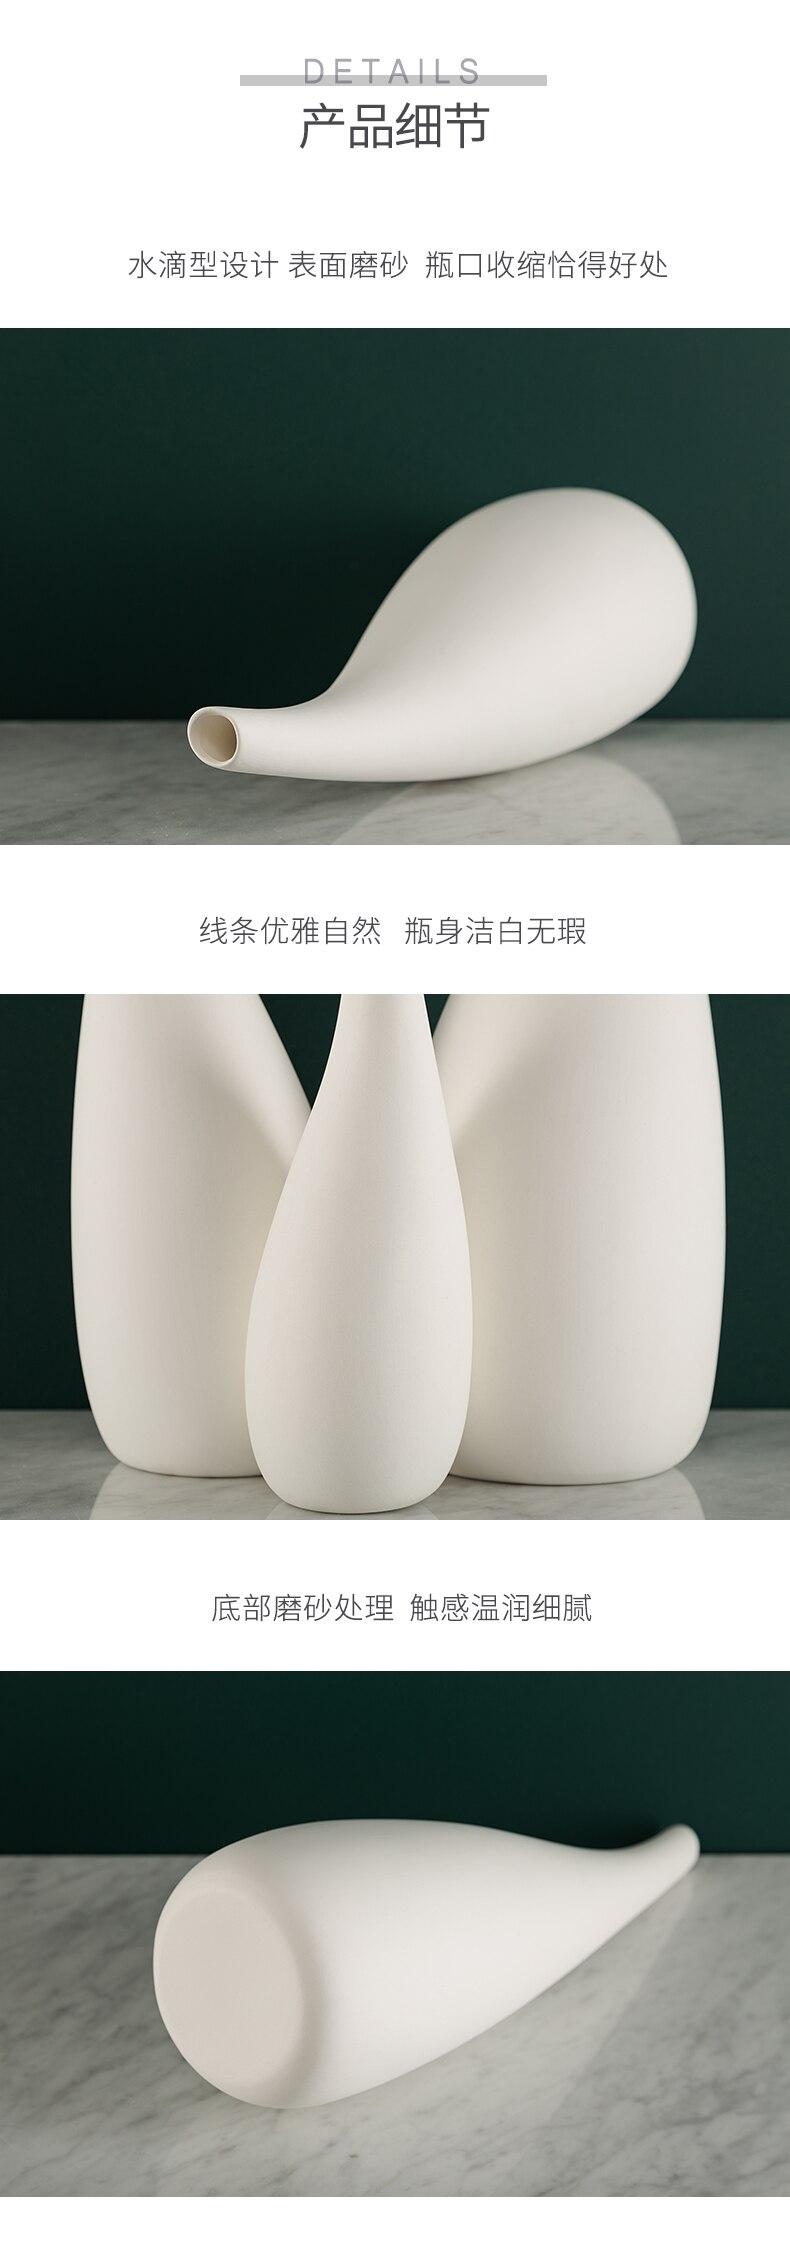 Nordic Creative ceramics vase Drop type white Flower vase Flower arrangement Modern home Decorative ornaments wedding vase